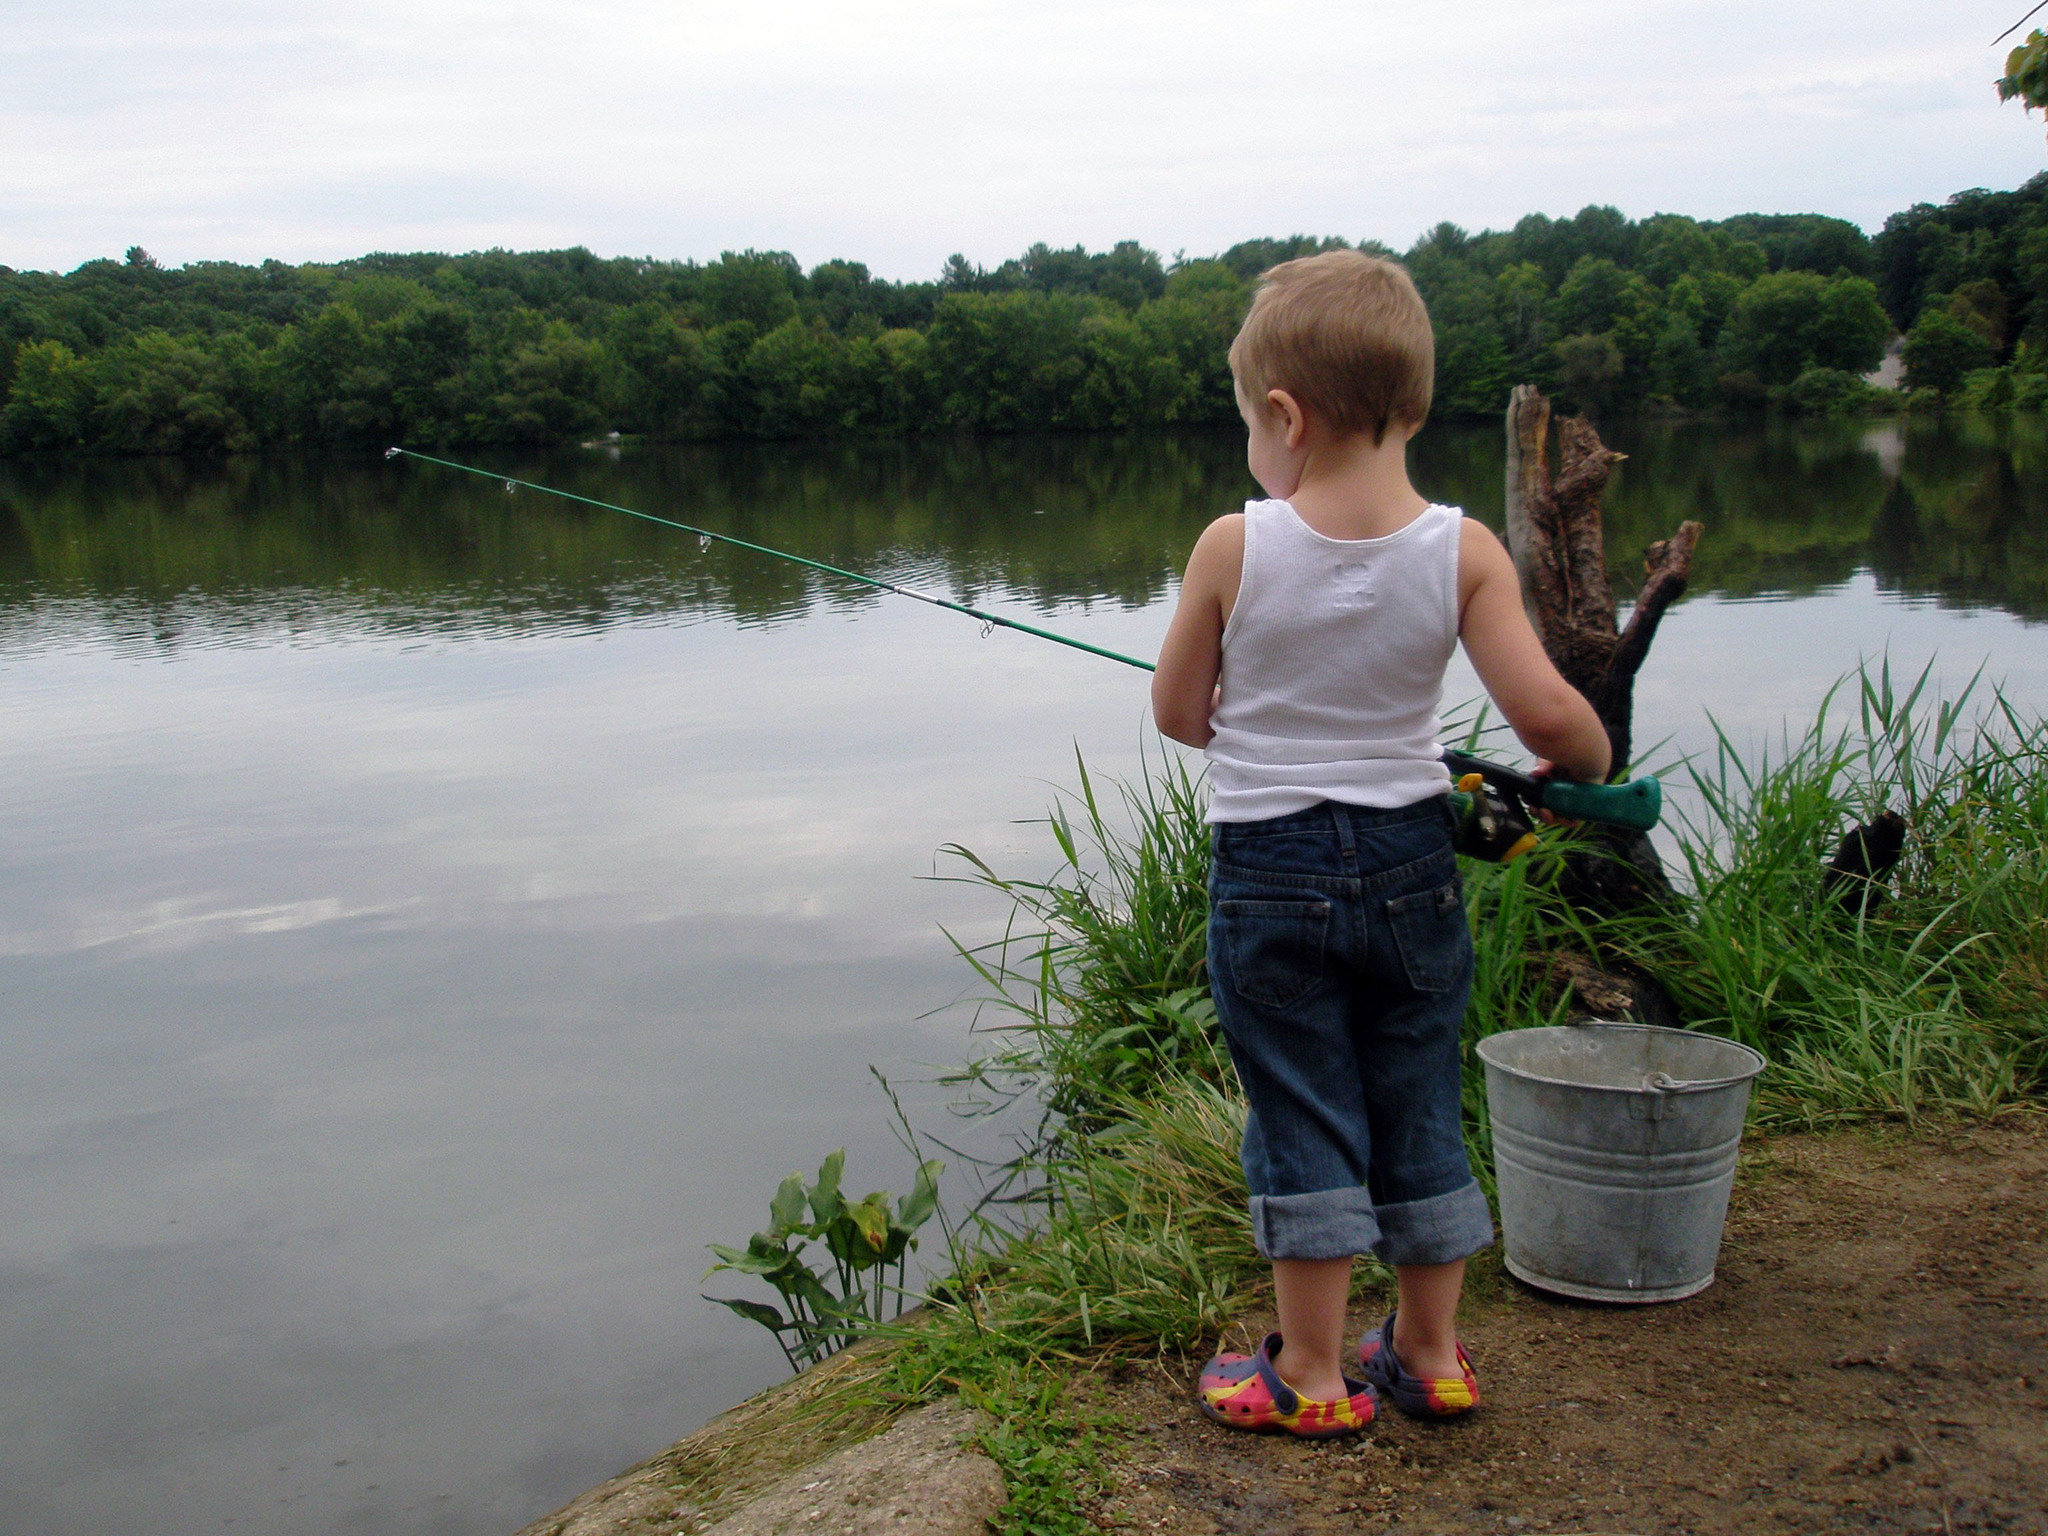 Child-Fishing.jpg